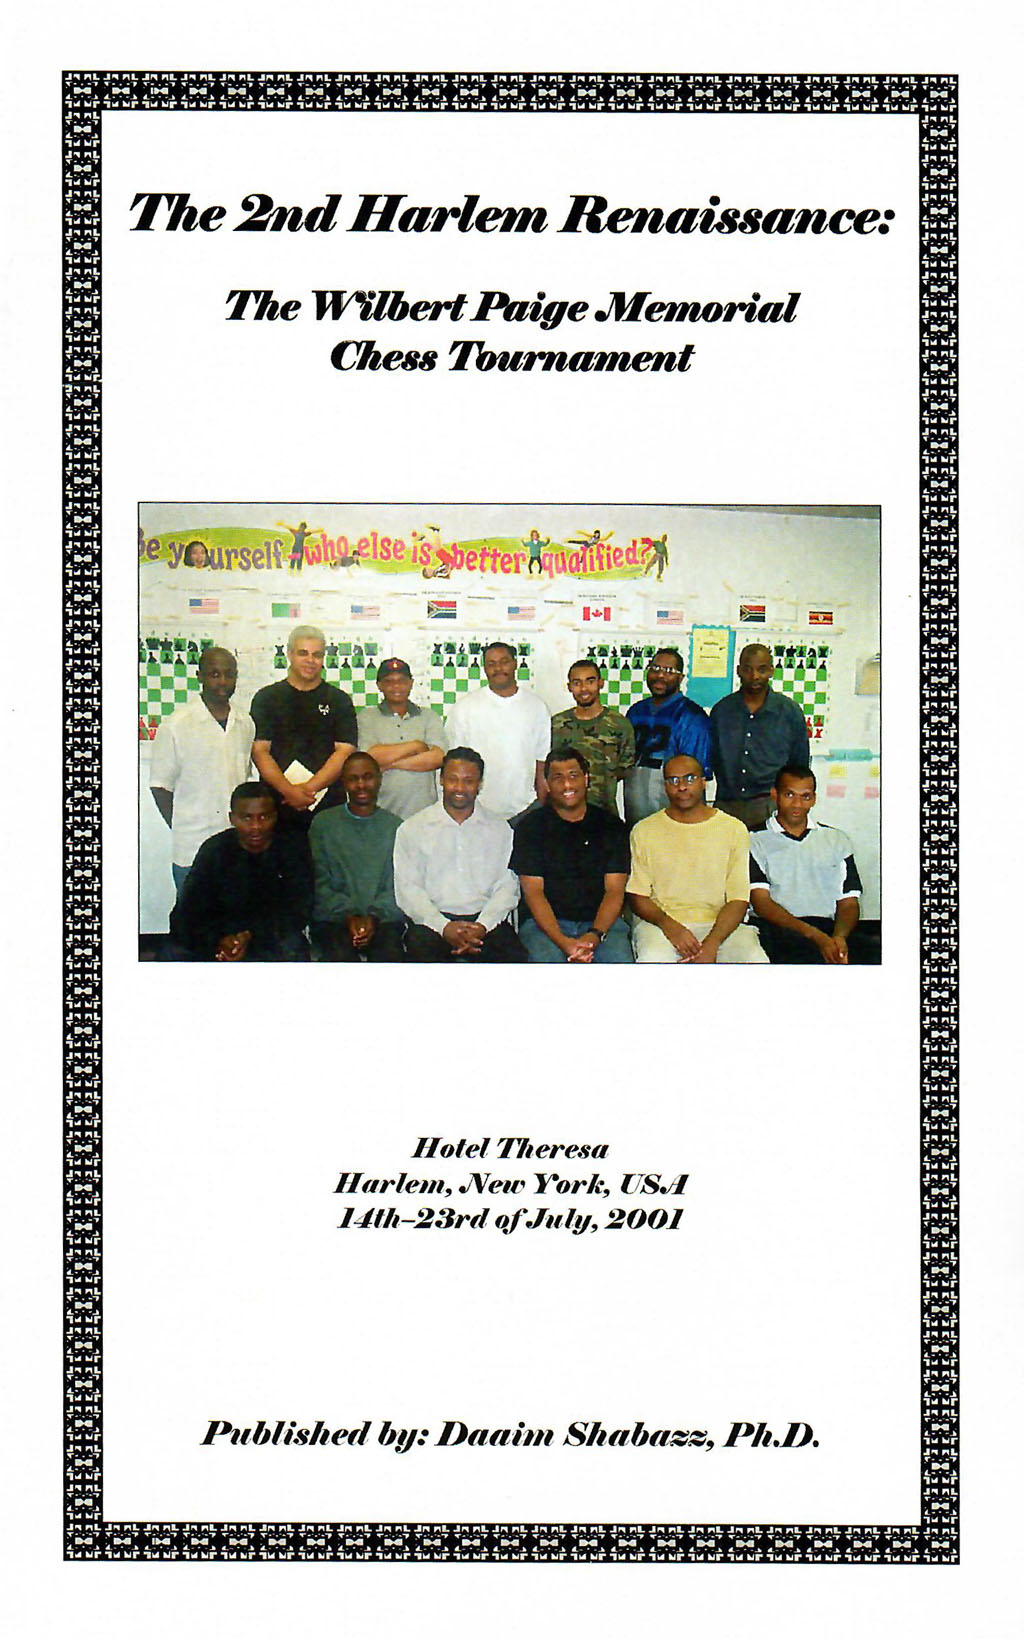 2001 Wilbert Paige Memorial Chess Tournament